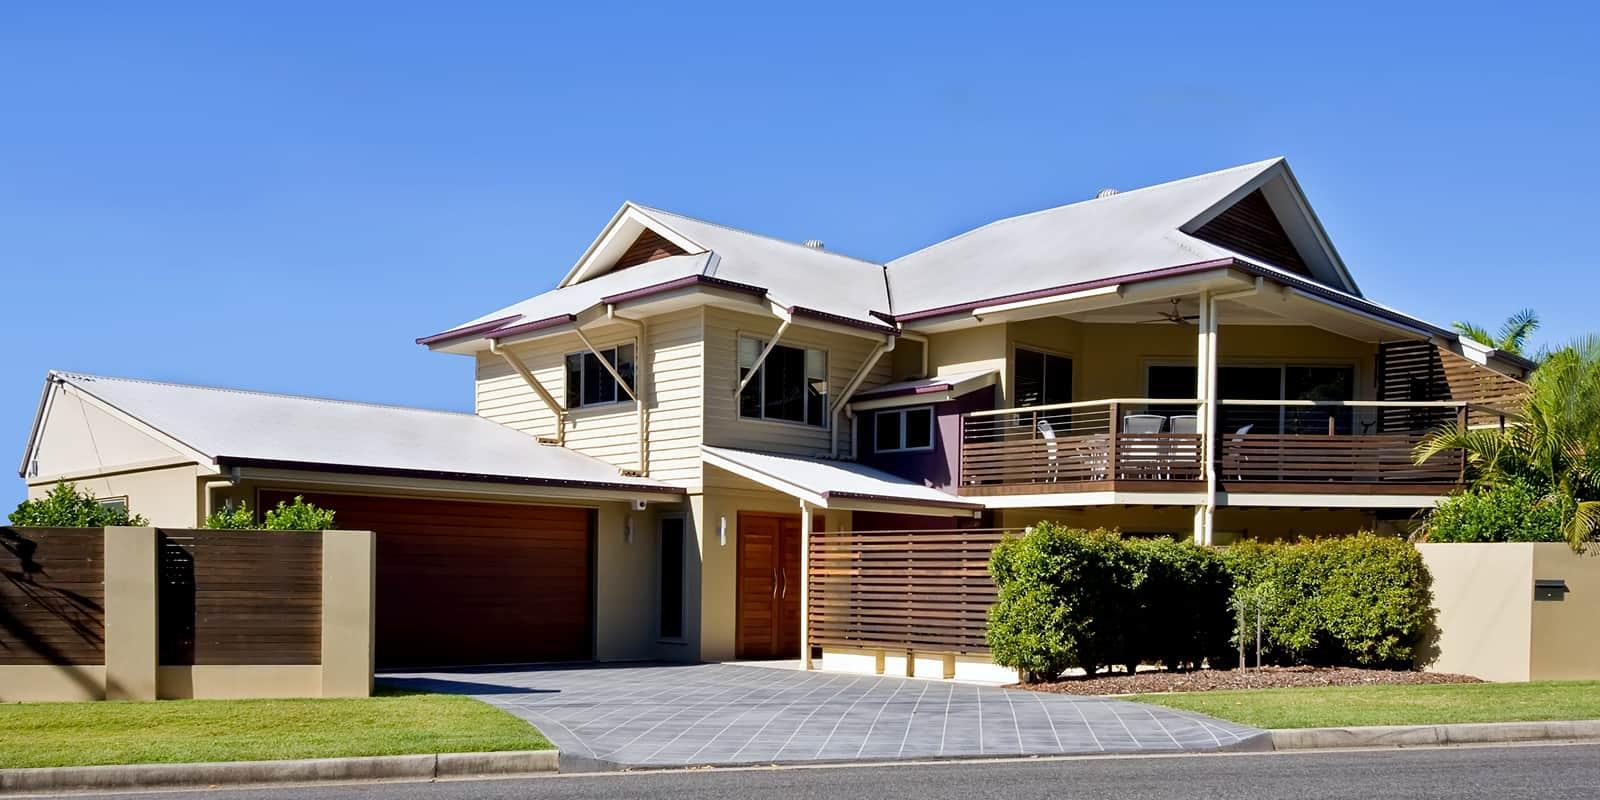 A large suburban house in Australia